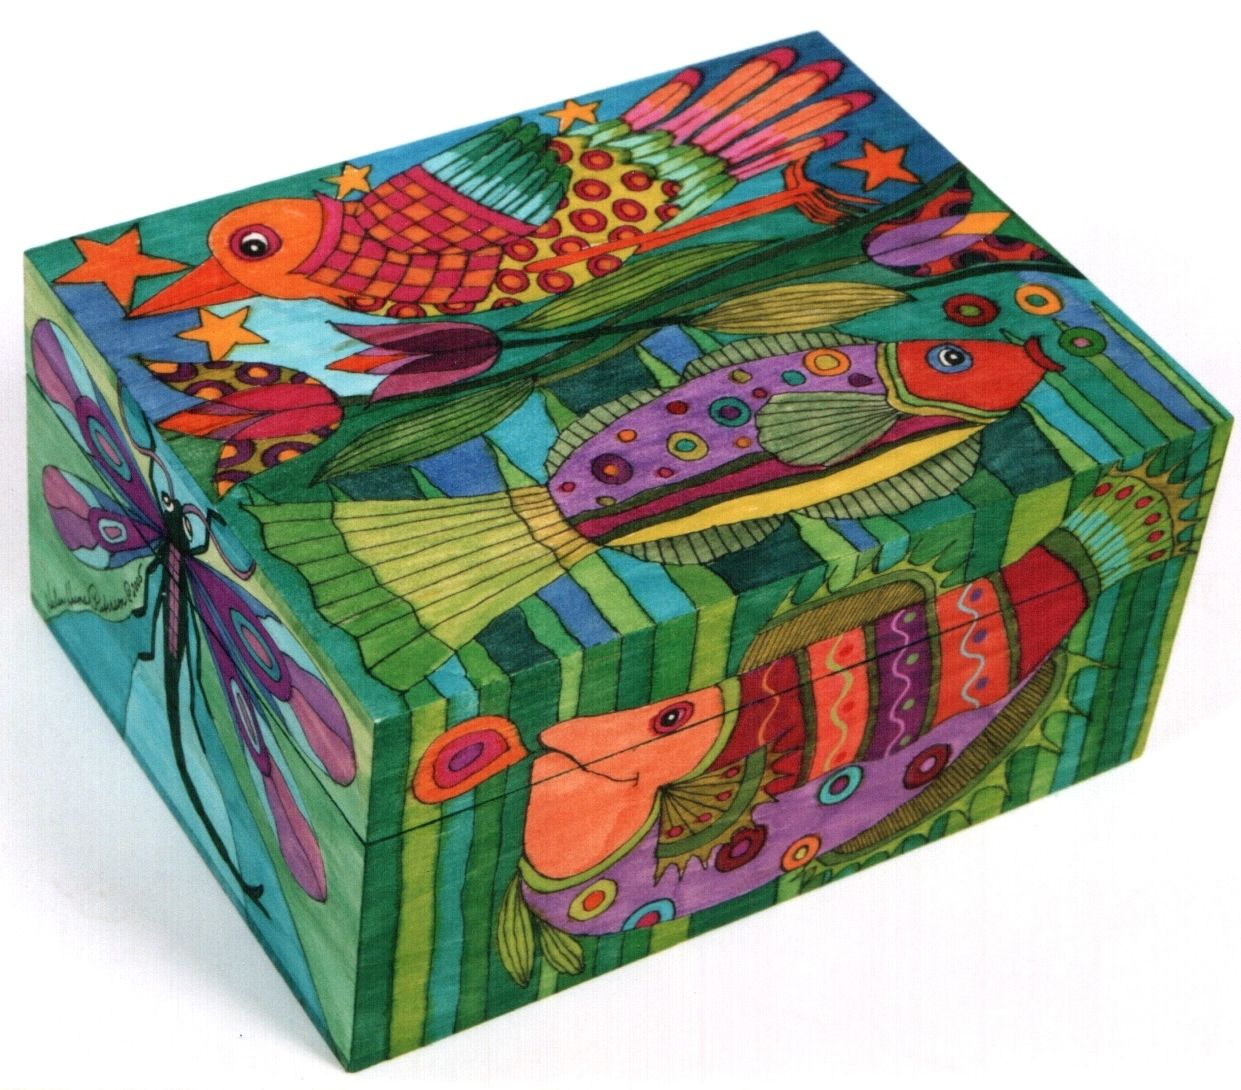 bird and fish box by helen heins peterson bunt pinterest treibholz bunt und holz. Black Bedroom Furniture Sets. Home Design Ideas